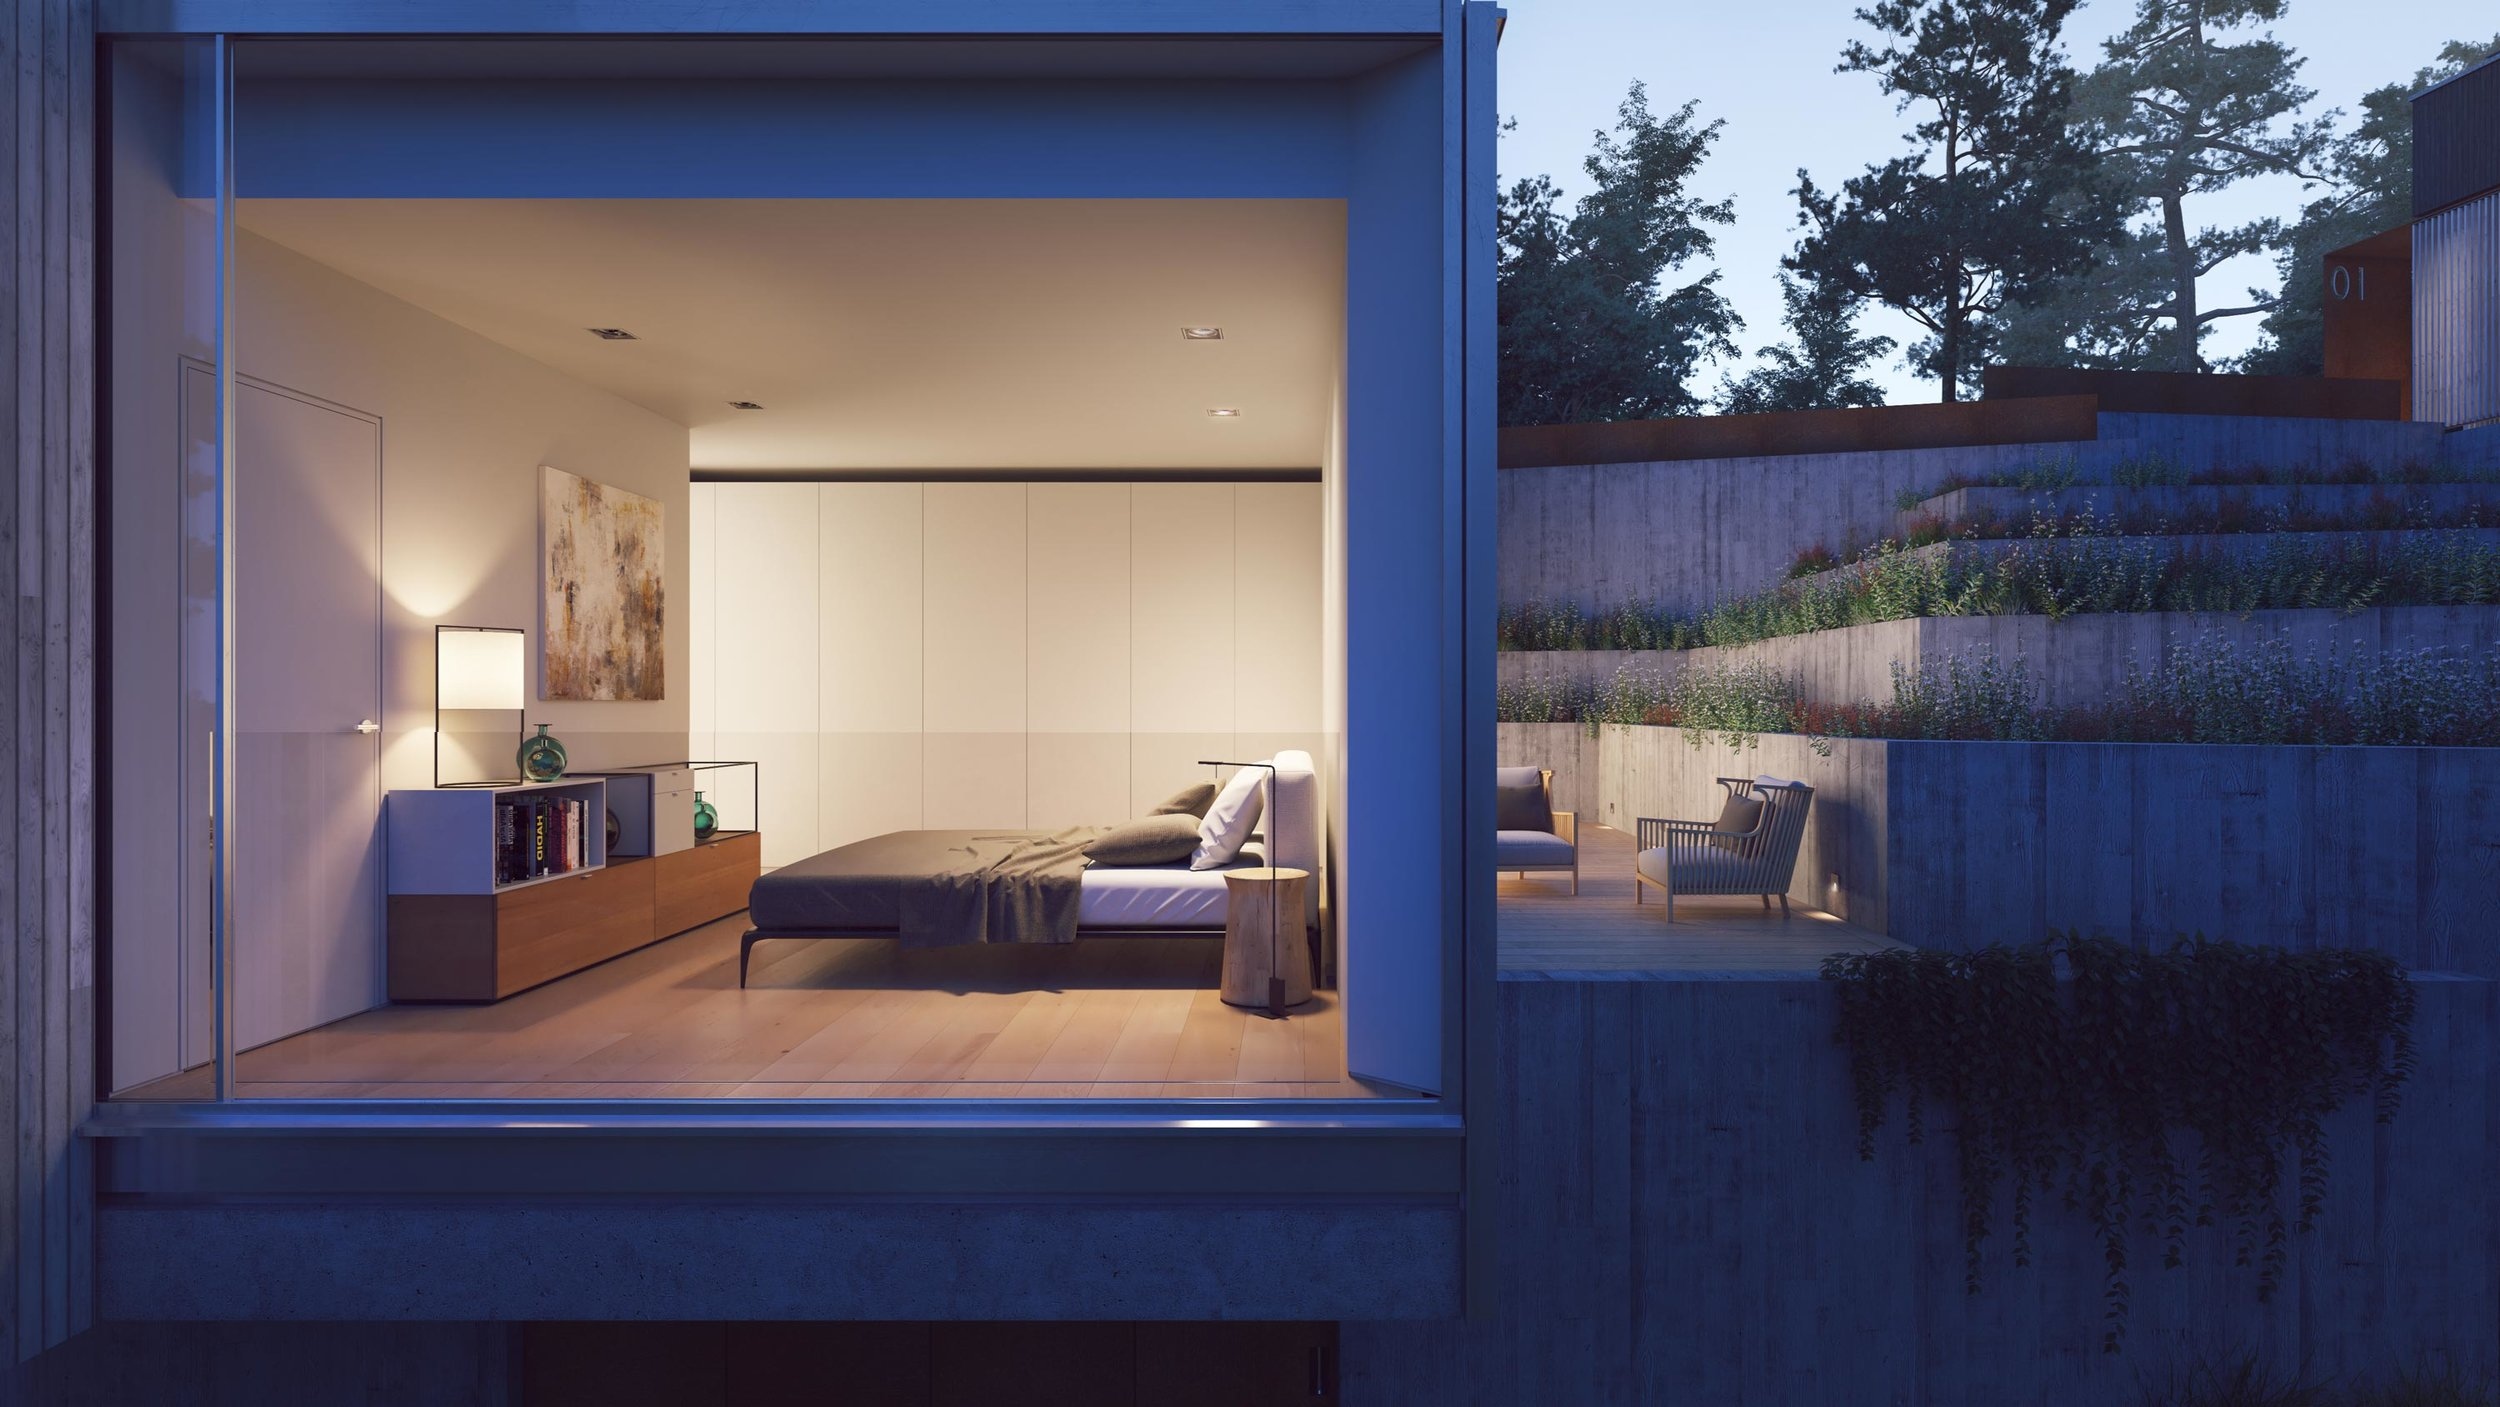 pyrus luxury villas, strom architects, imola, 7.jpg